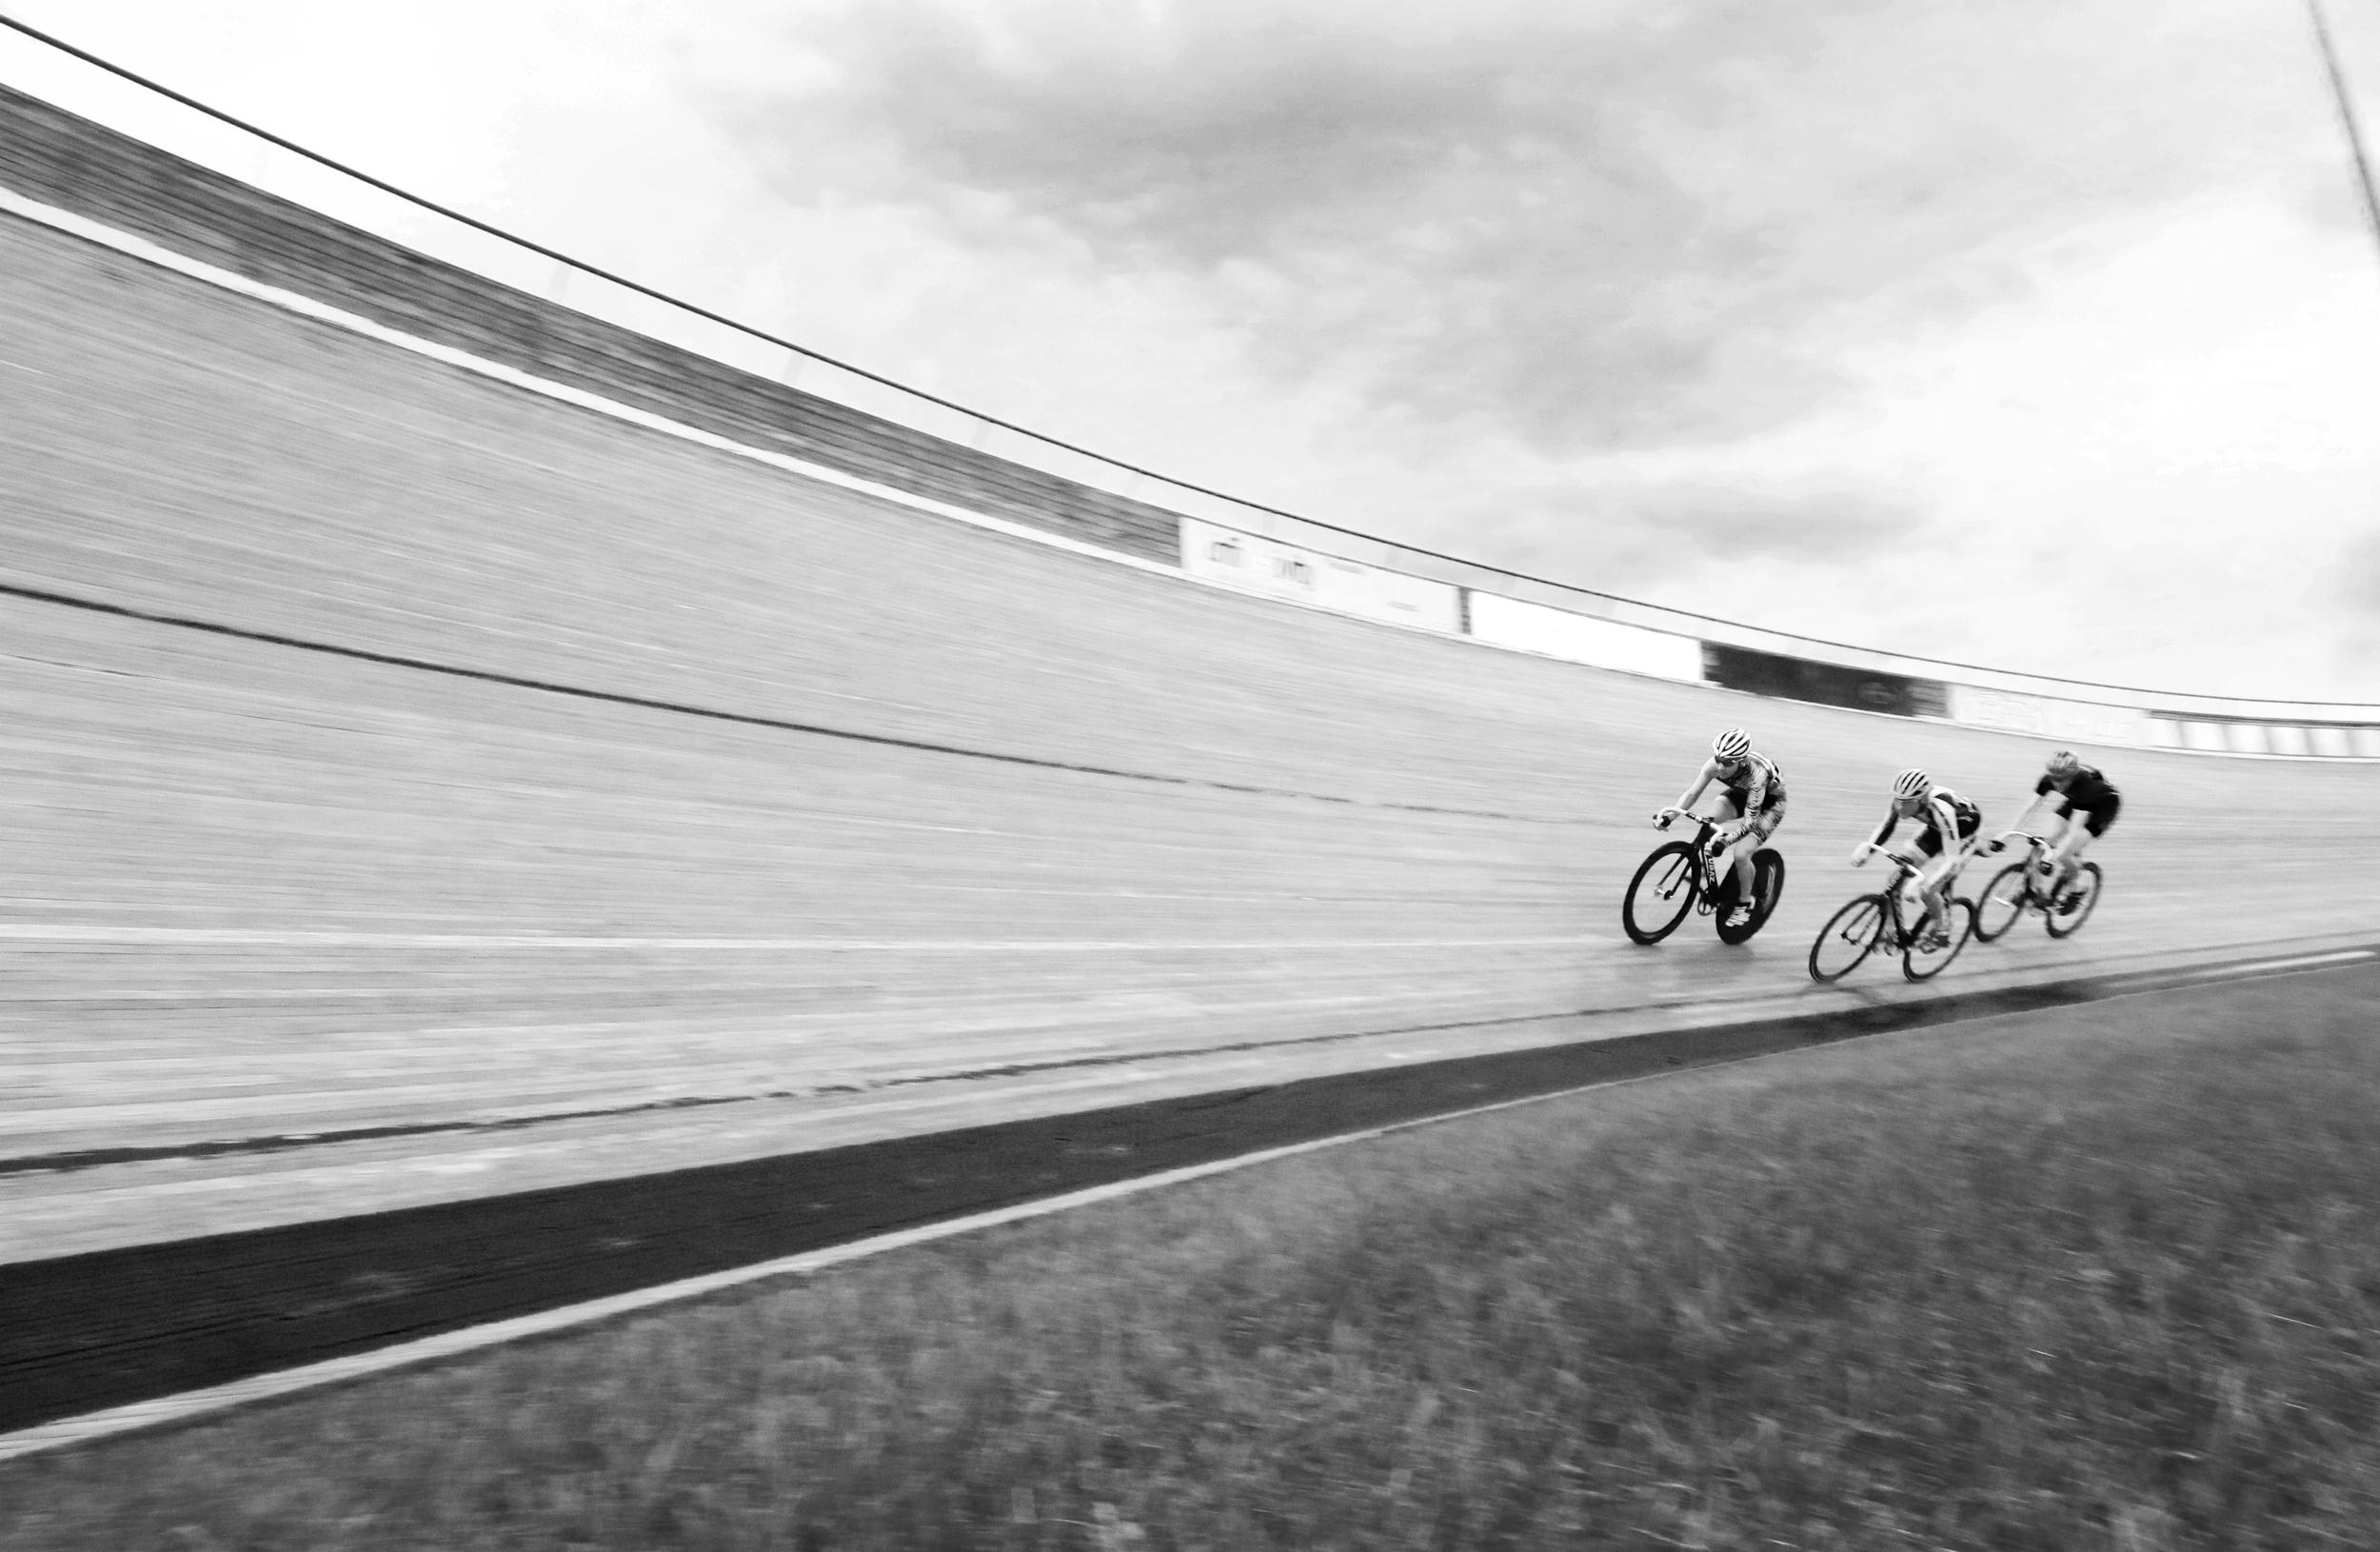 biketrack5jbarnett.jpg